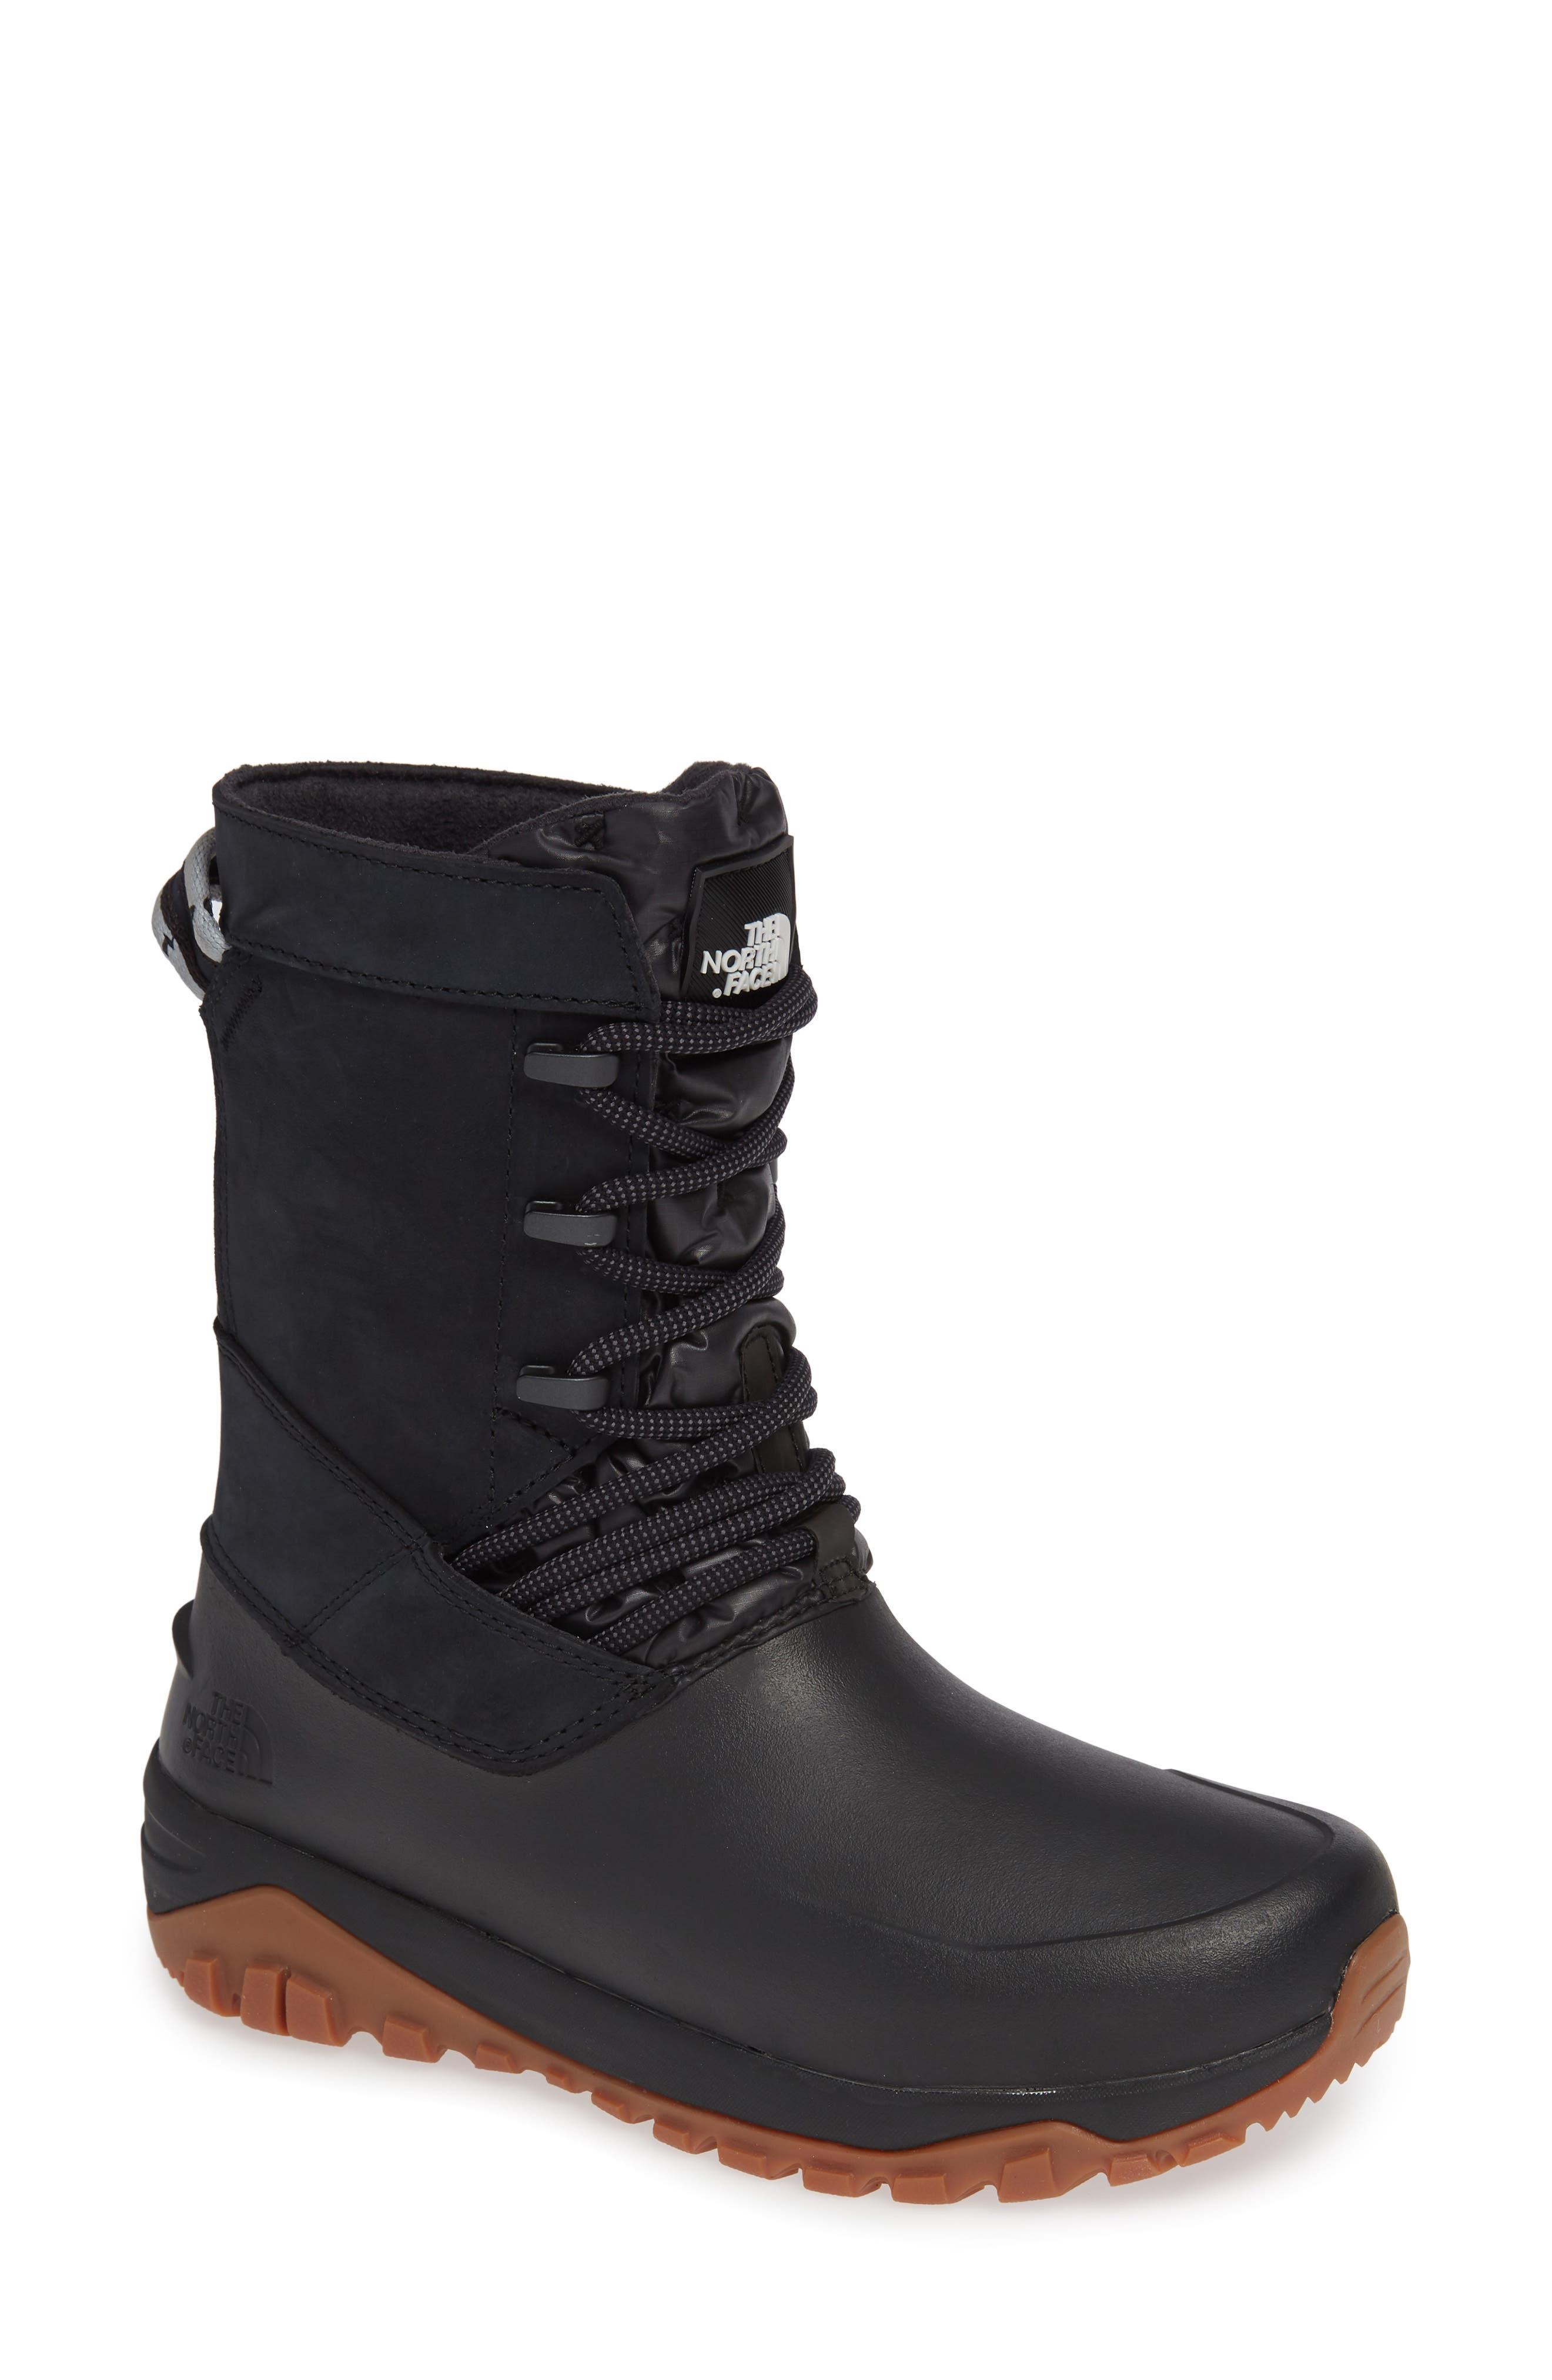 Yukiona Waterproof Winter Boot,                             Main thumbnail 1, color,                             BLACK/ BLACK